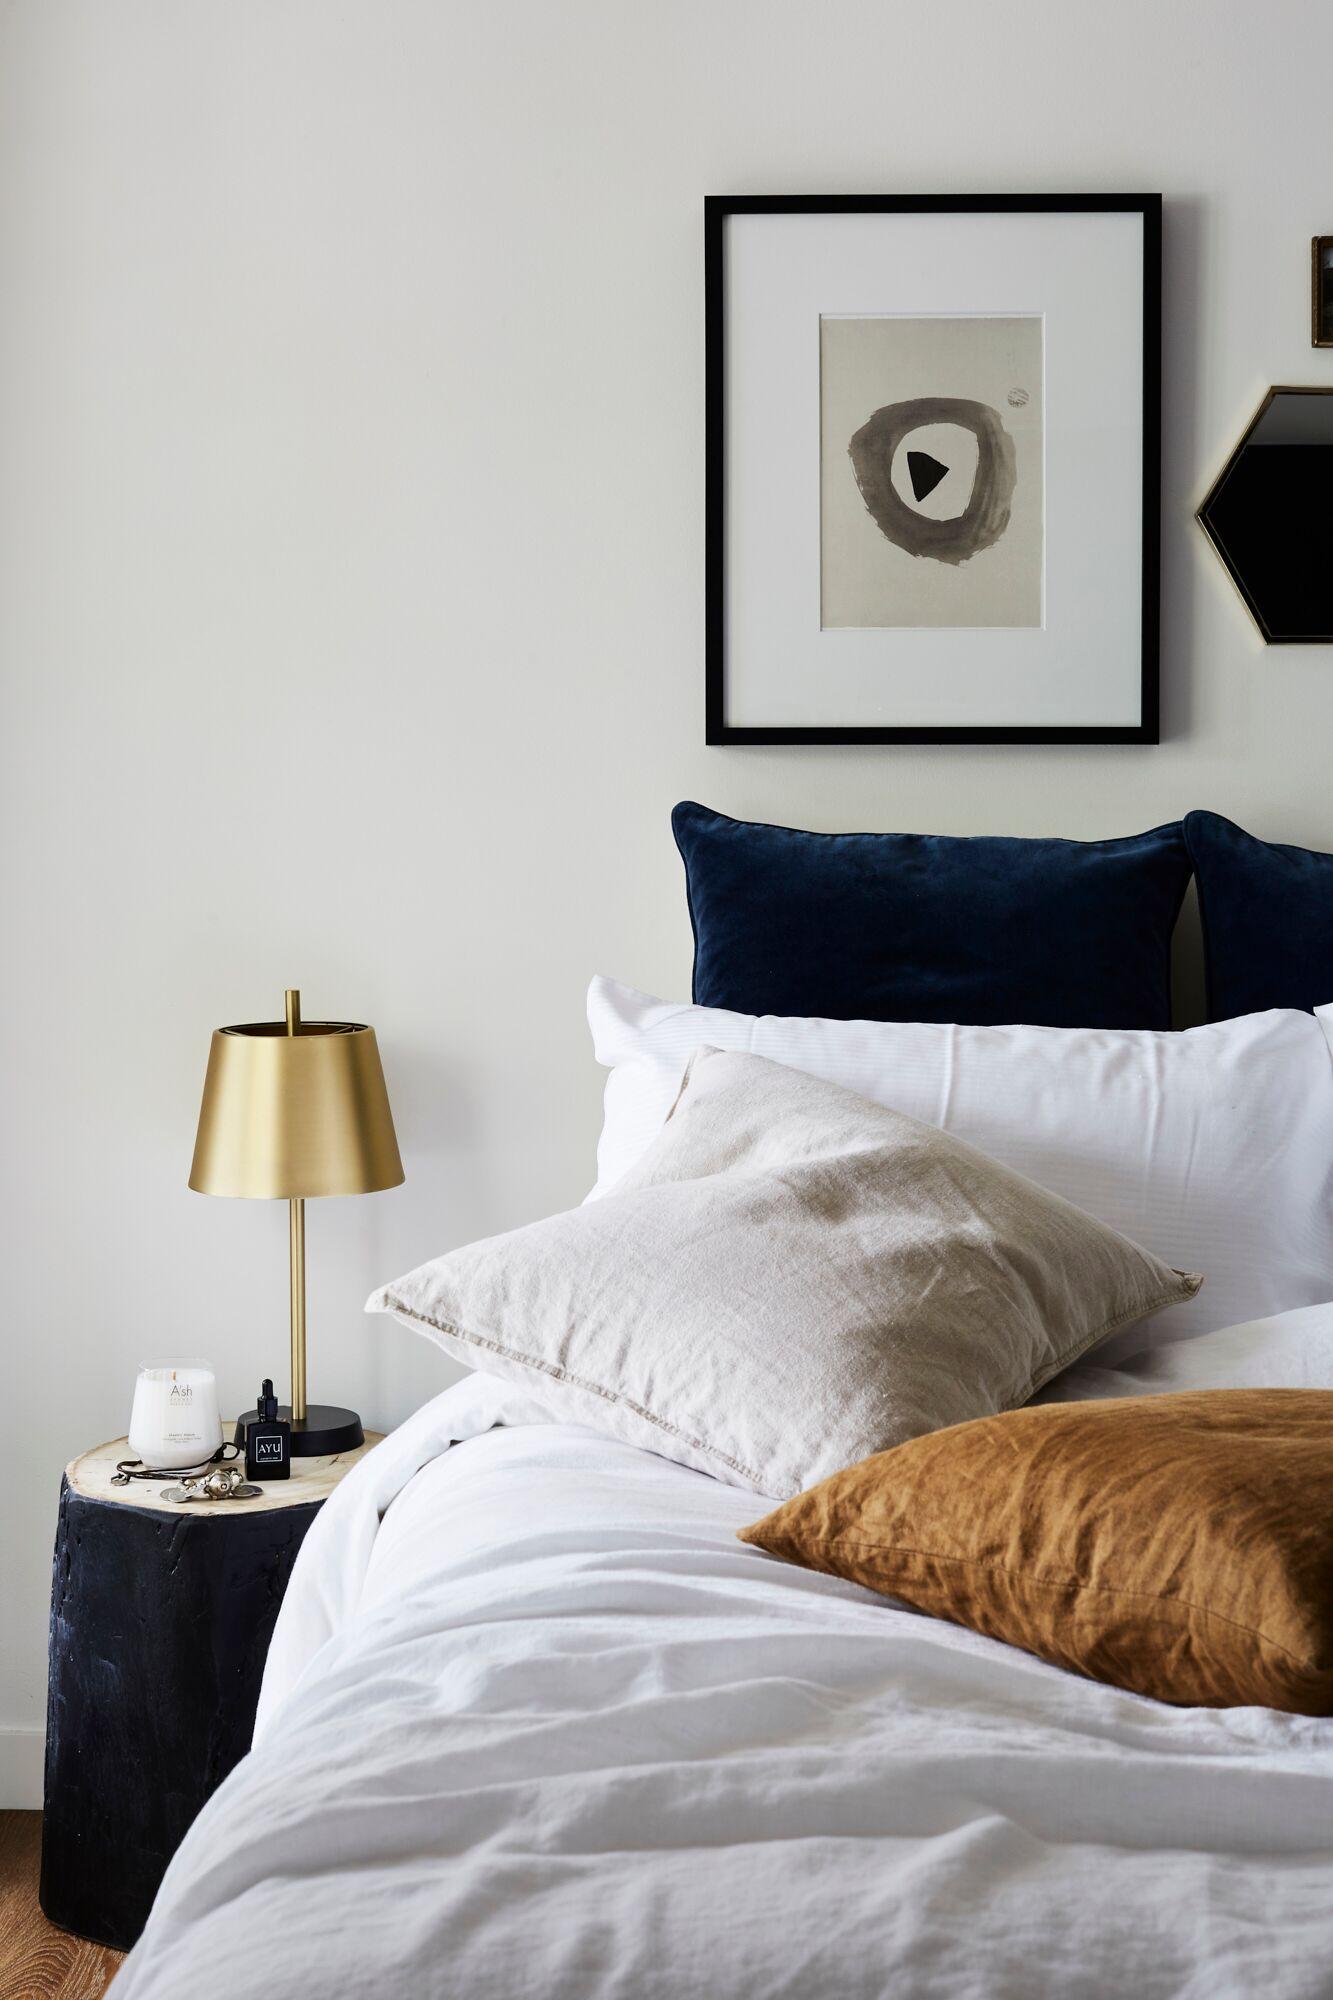 The Bower, byron bay accomodation, travel ideas, property styling 9.jpg